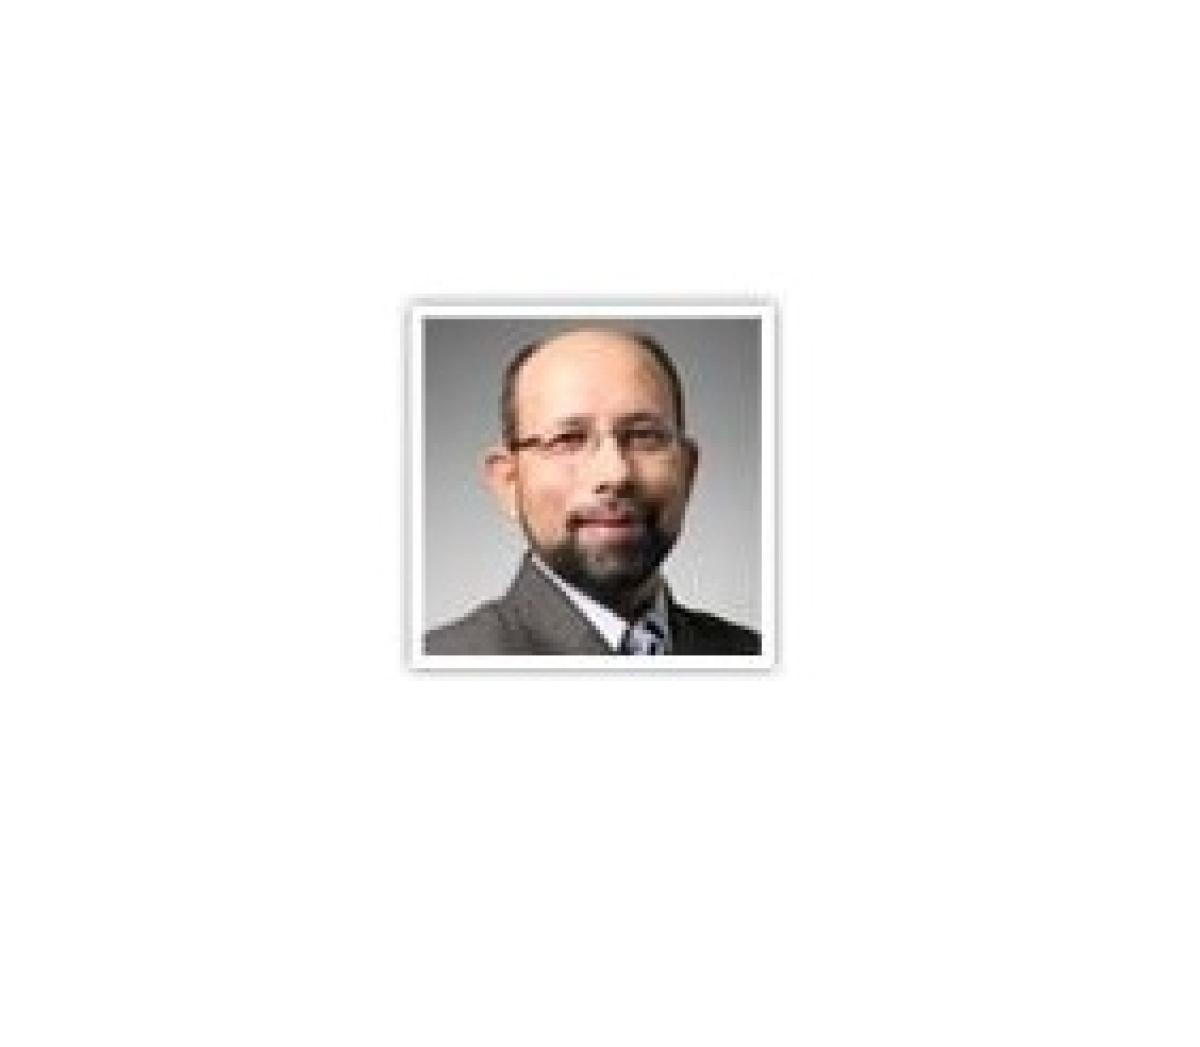 Adfactors PR appoints Nikhil Dey as Executive Director